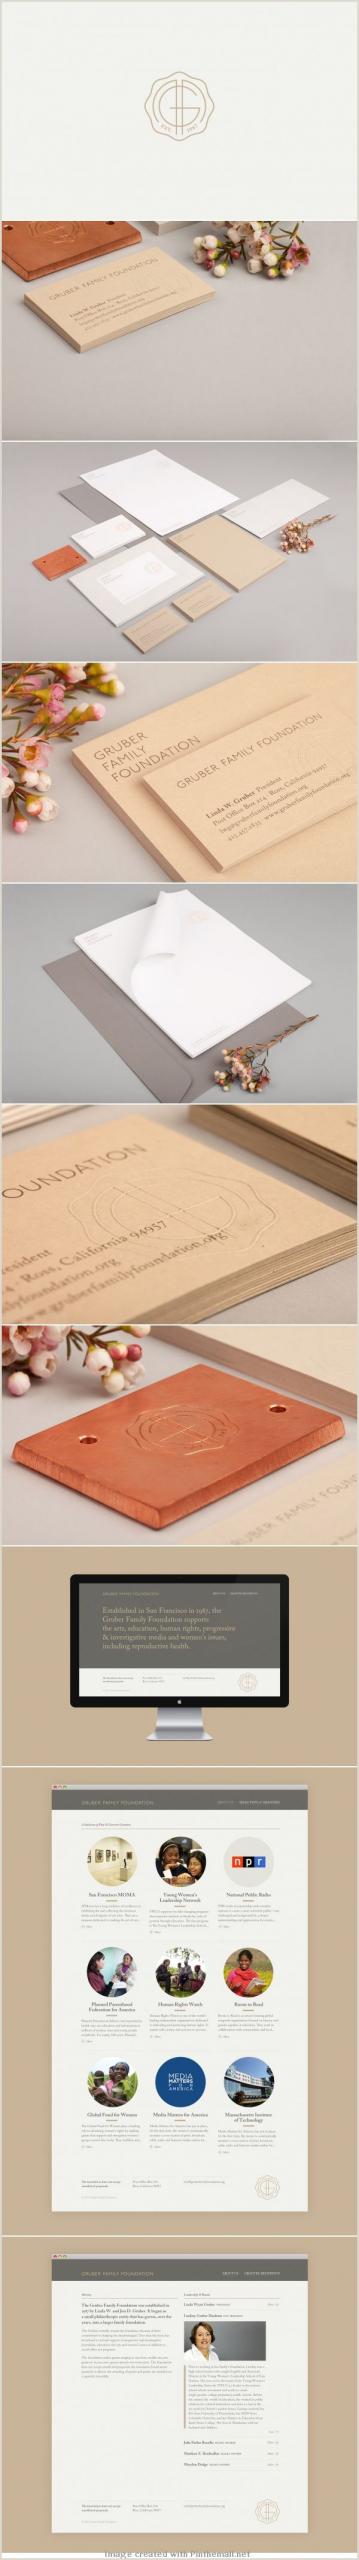 Name Card Ideas 14 Popular Hardwood Flooring Business Card Template